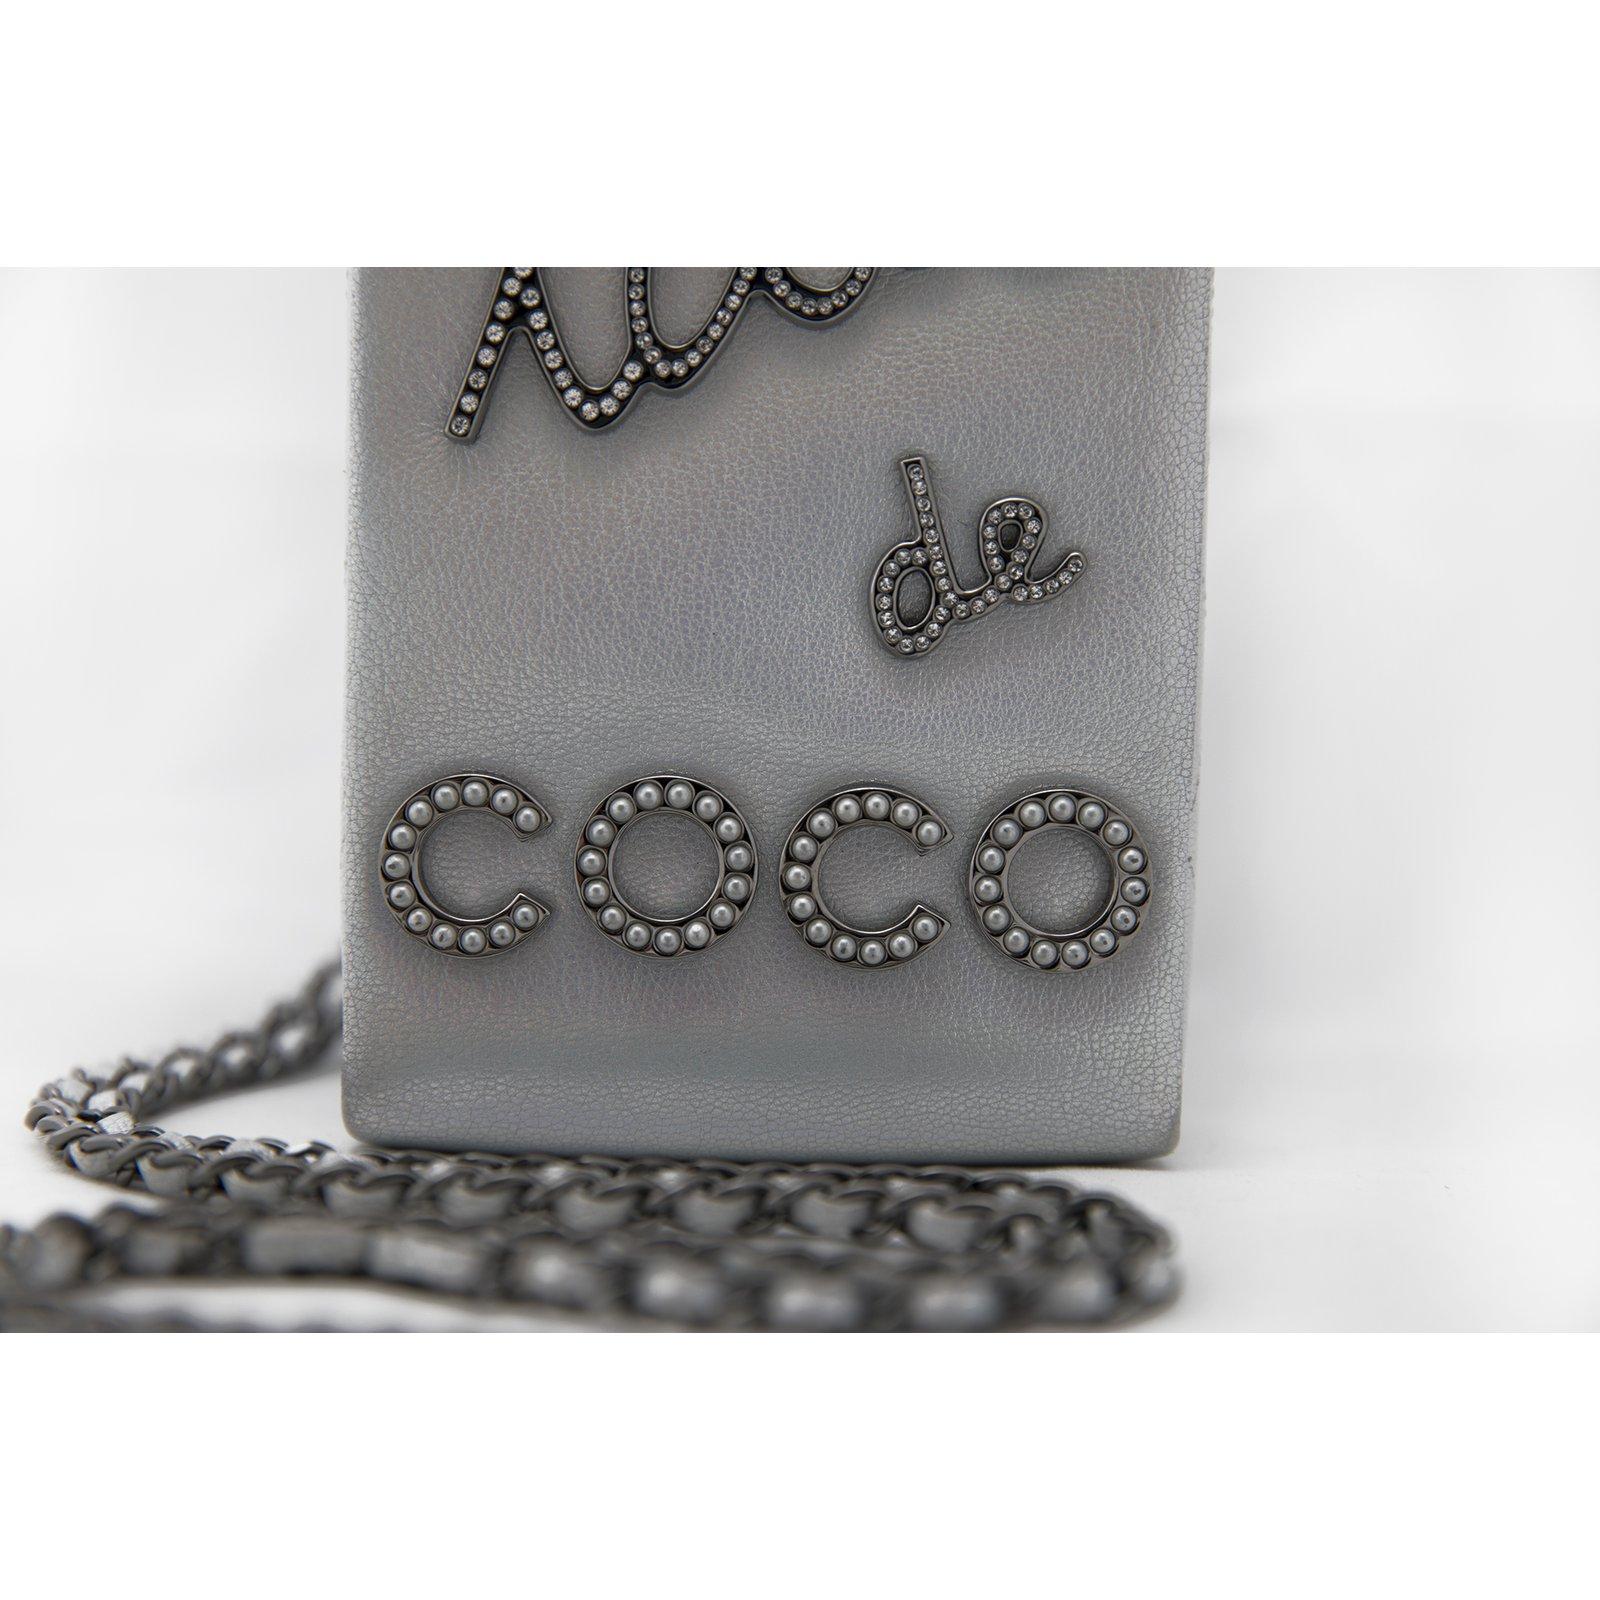 35a294810a6b Chanel Lait de Coco Bag 14A Fall 2014 Supermarket Collection Handbags  Leather,Goatskin Silvery ref.49652 - Joli Closet